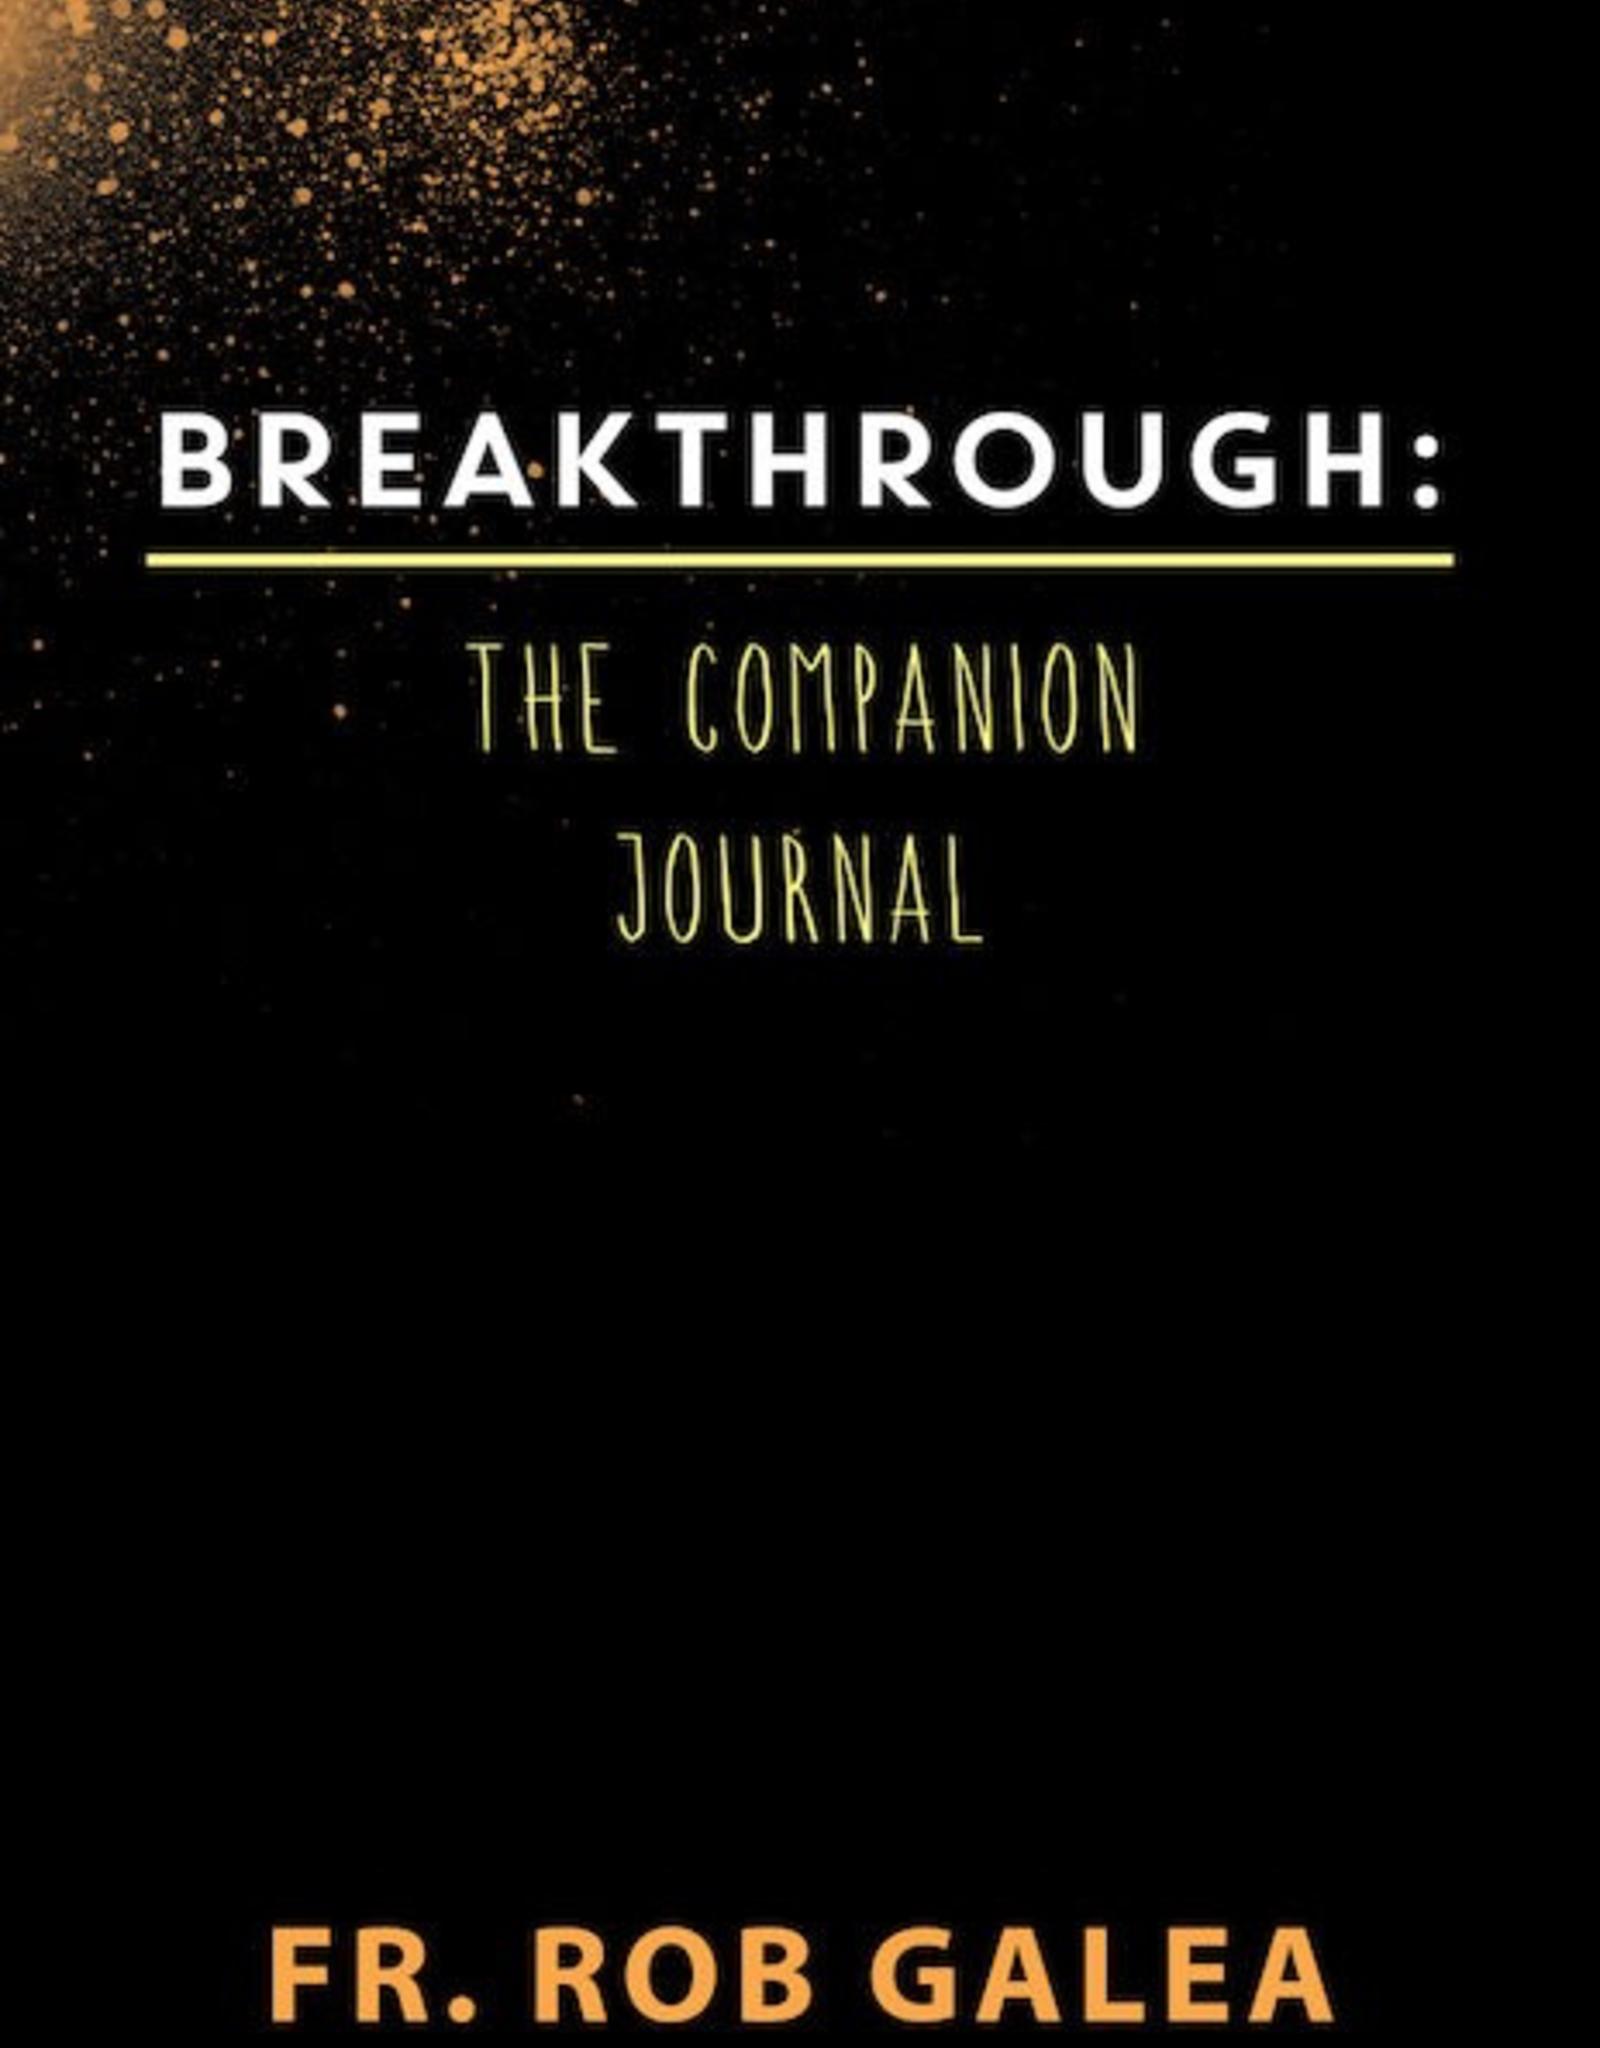 Ave Maria Press Breakthrouigh:  The Companion Journal